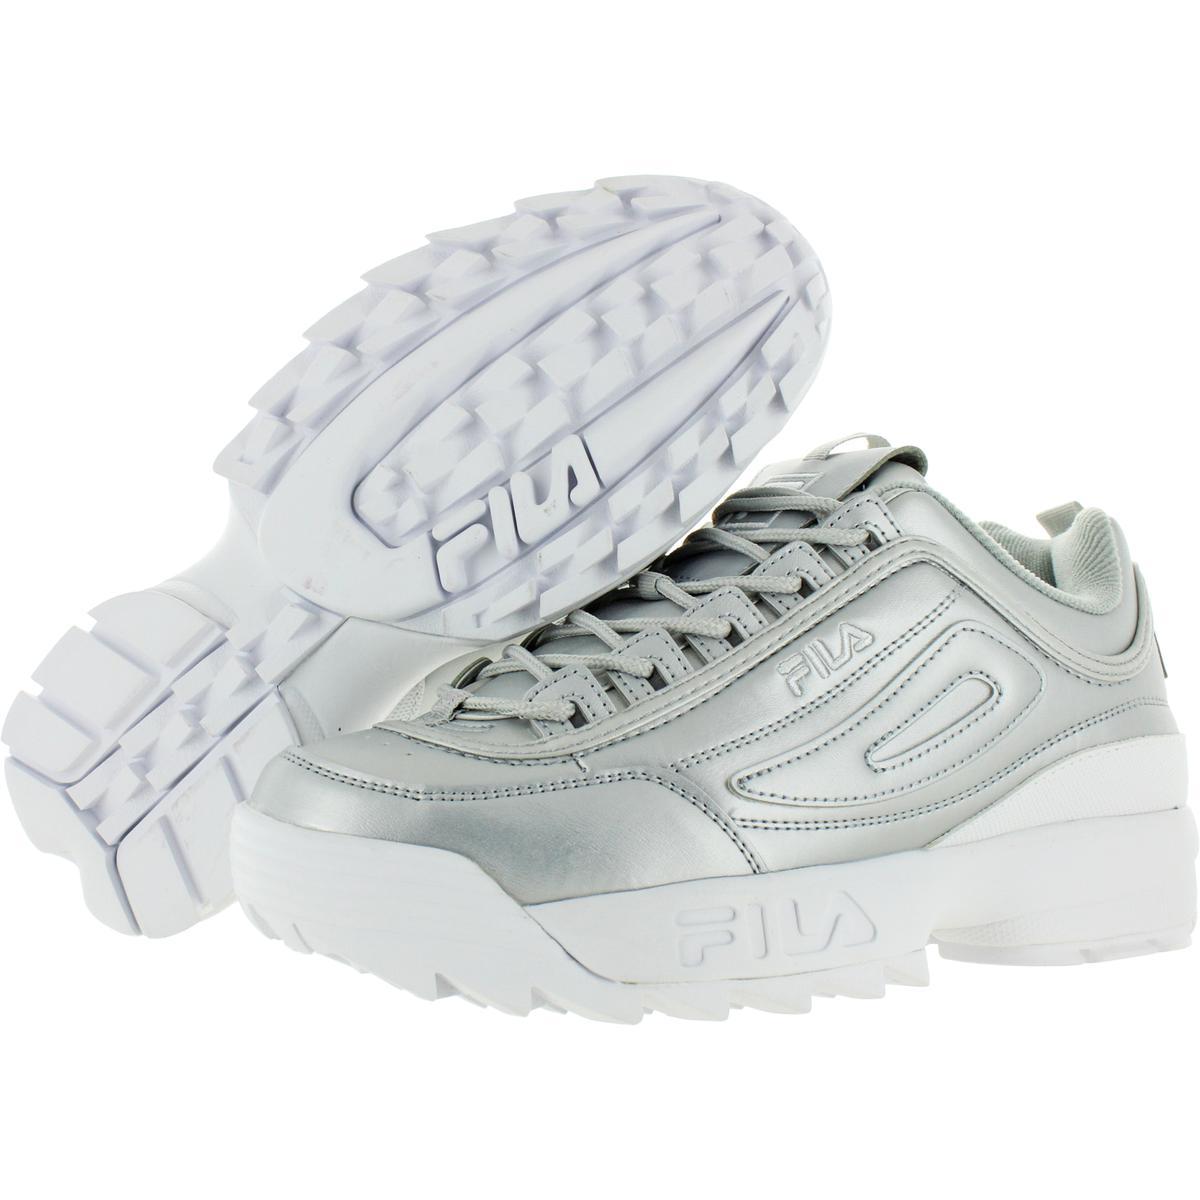 Fila-Womens-Disruptor-II-Premium-Metallic-Trainers-Sneakers-Shoes-BHFO-5237 thumbnail 8